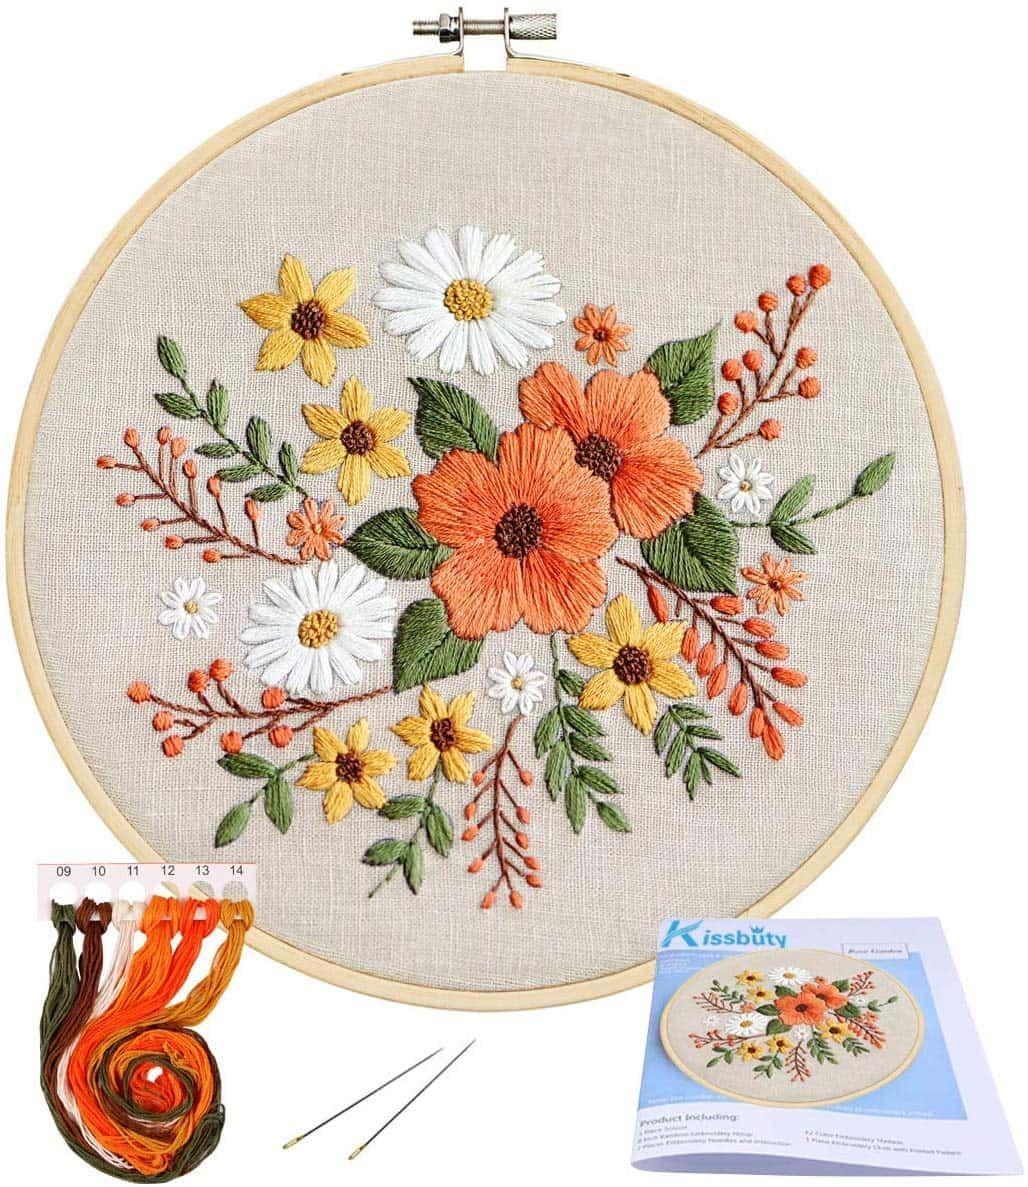 Stamped needlepoint kit Bead embroidery kit Floral needlepoint Bead cross stitch kit Beginner bead embroidery Needlepoint kit floral